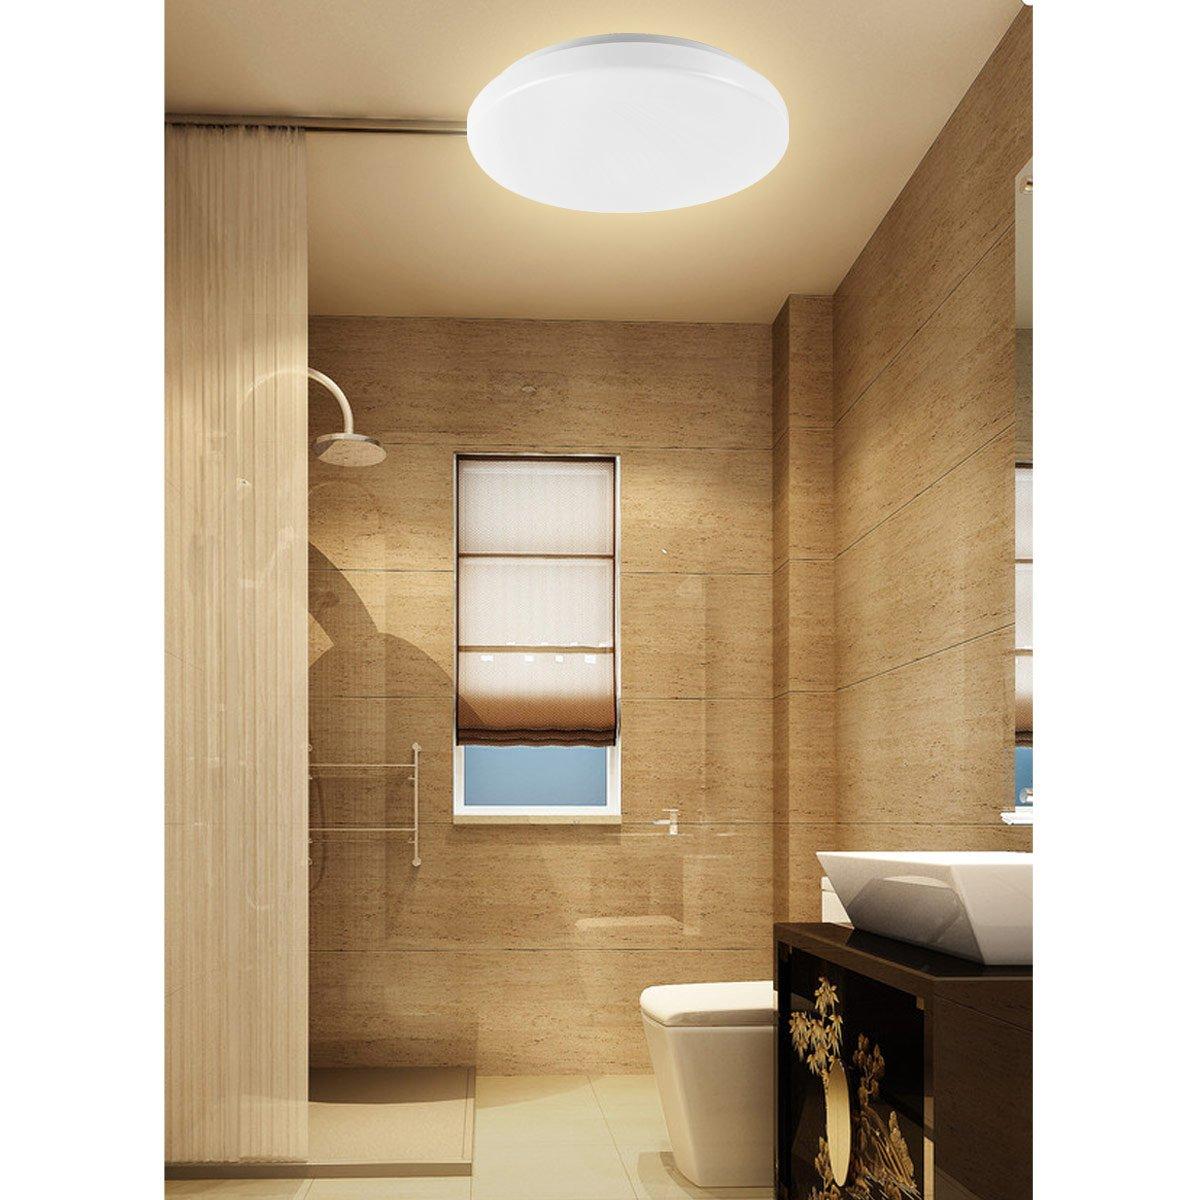 deckenlampe fr flur perfect gallery of led lampe flur avec lampe fr flur et led lampe flur flur. Black Bedroom Furniture Sets. Home Design Ideas